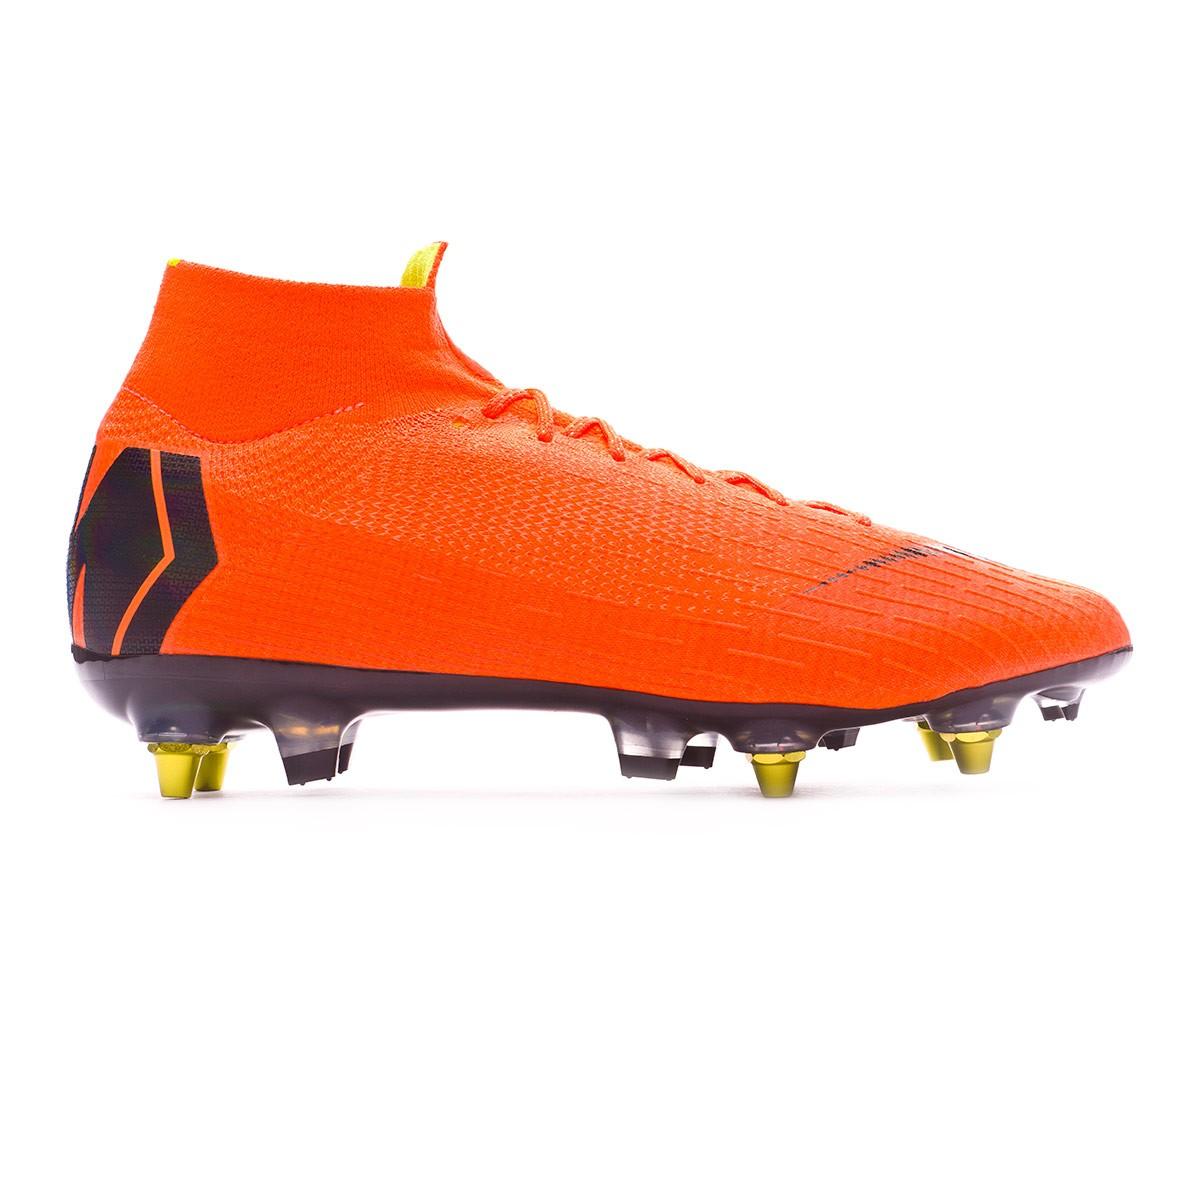 online store d0220 9dfa0 Football Boots Nike Mercurial Superfly VI Elite SG-Pro Anti-Clog Total  orange-Black-Volt - Football store Fútbol Emotion